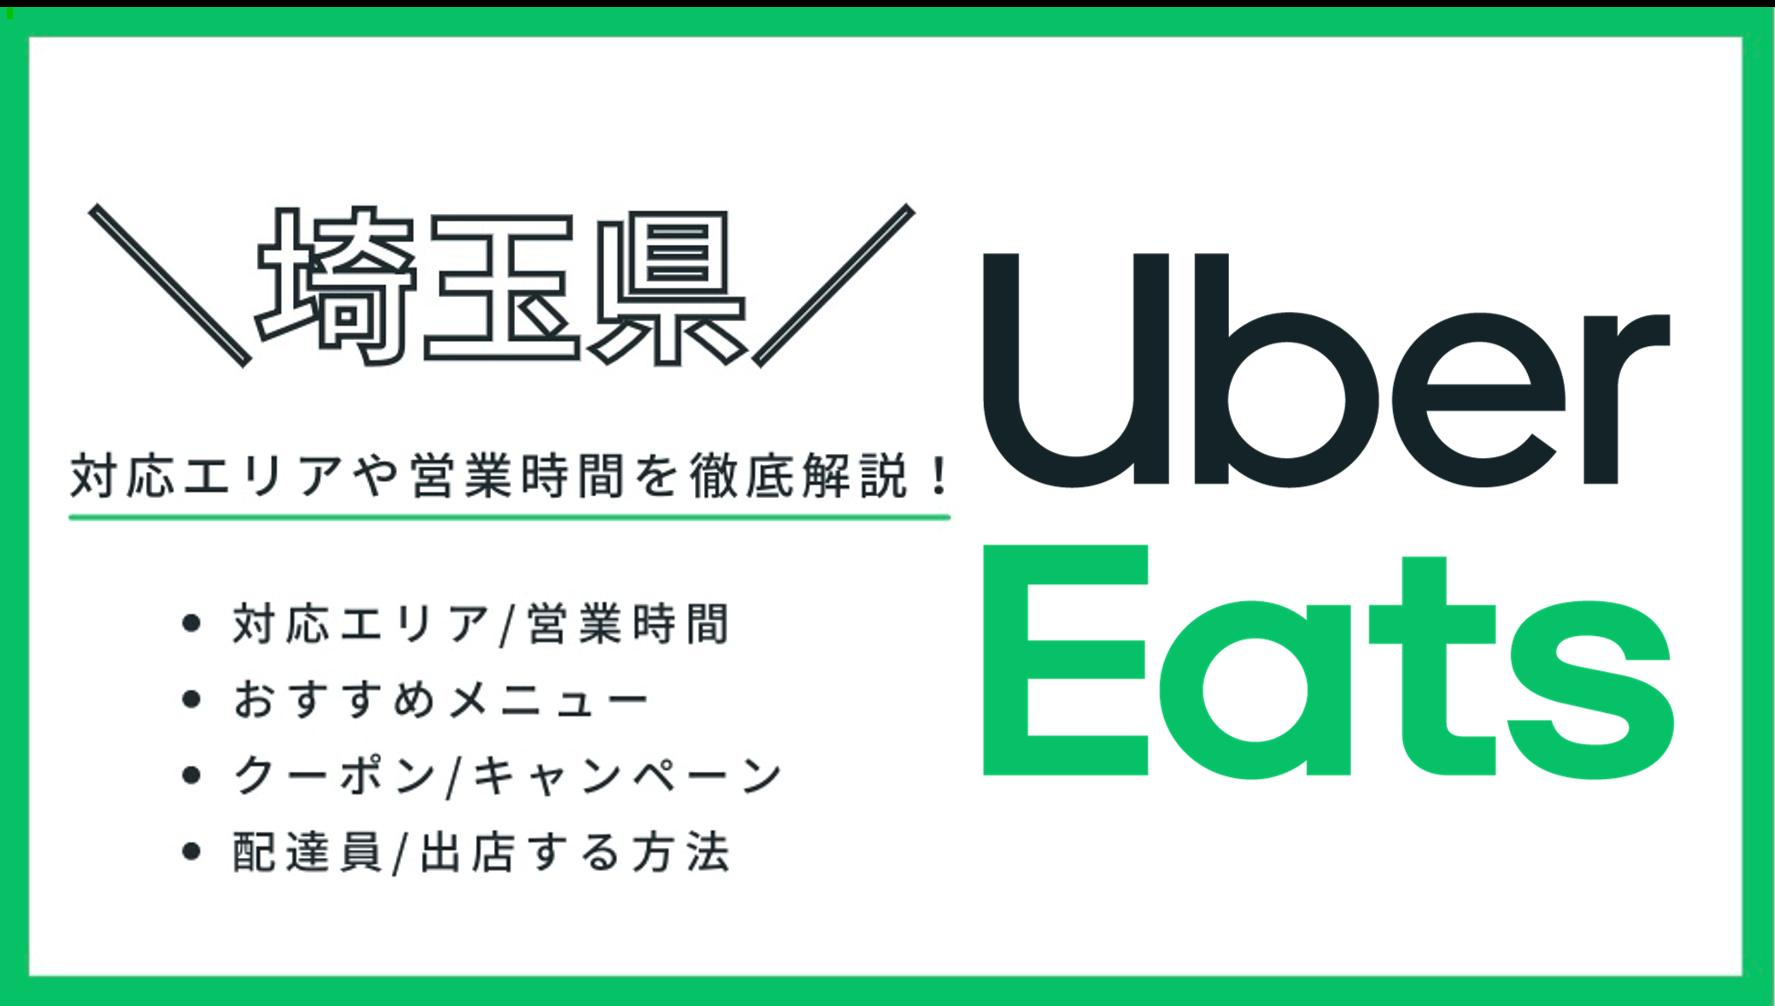 Uber Eats(ウーバーイーツ)埼玉県の配達エリア・料金・メニュー情報【クーポン・配達パートナー登録も】